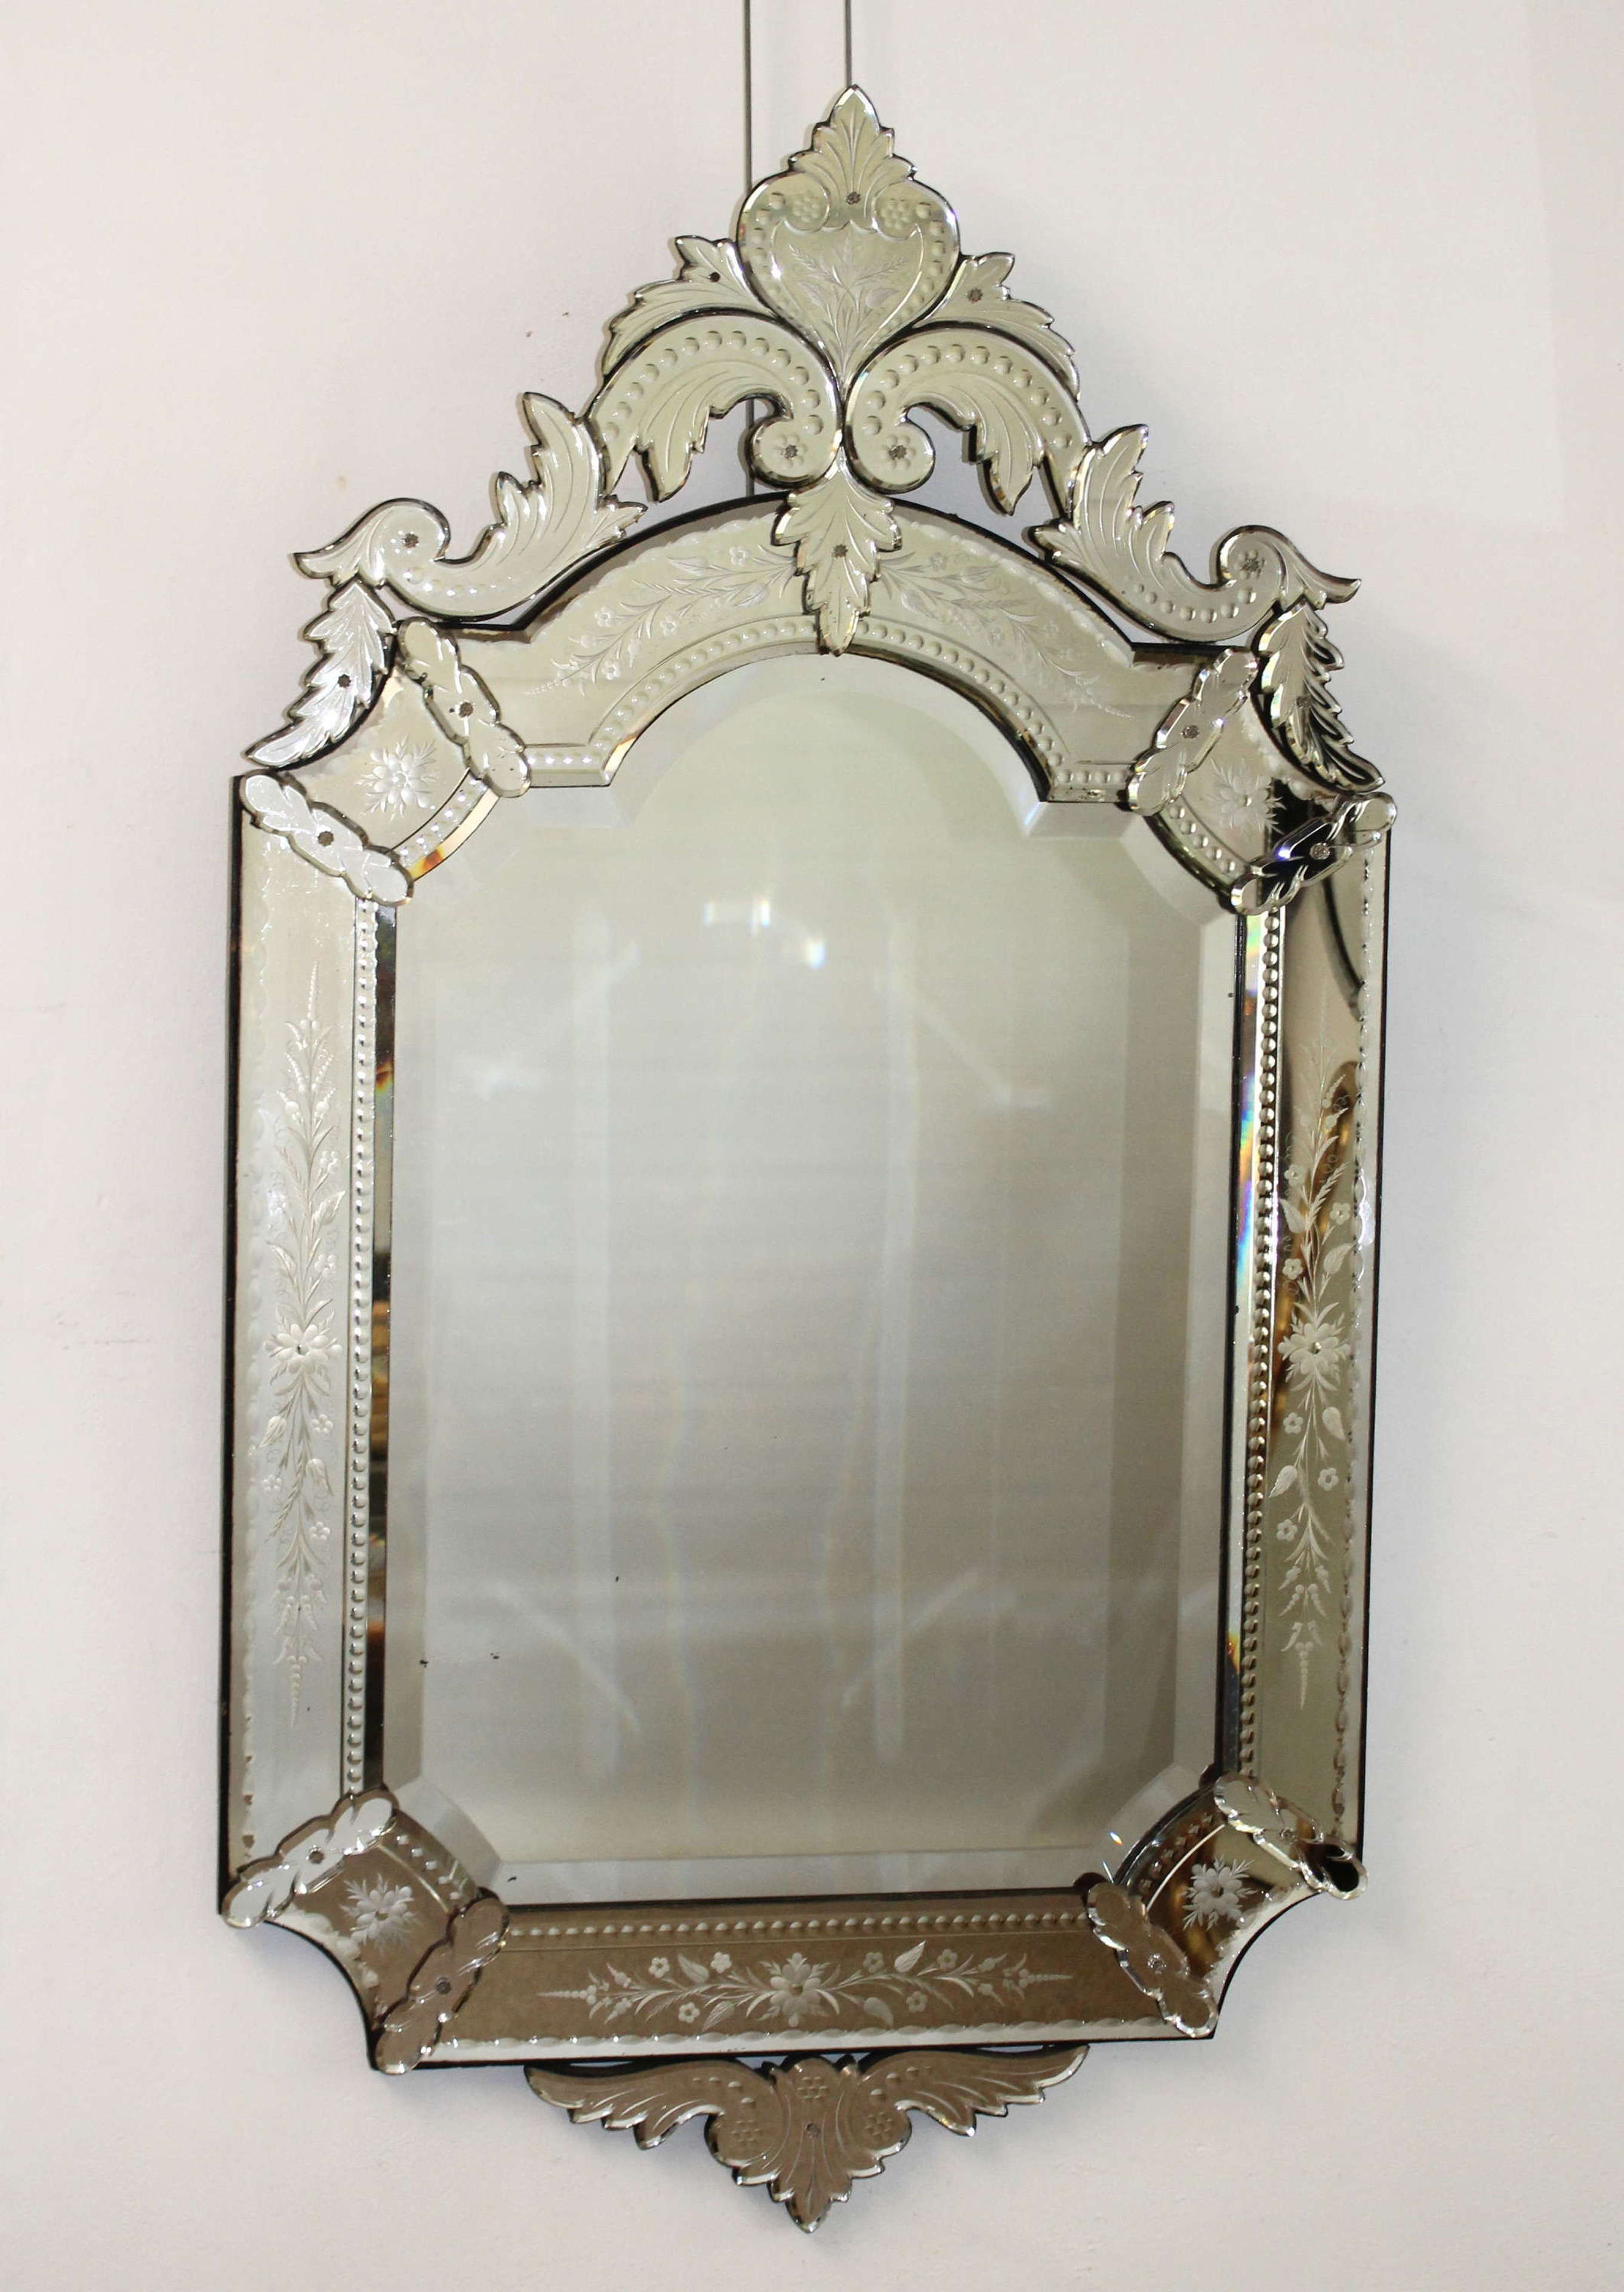 Decorative, portrait, antique Venetian mirror